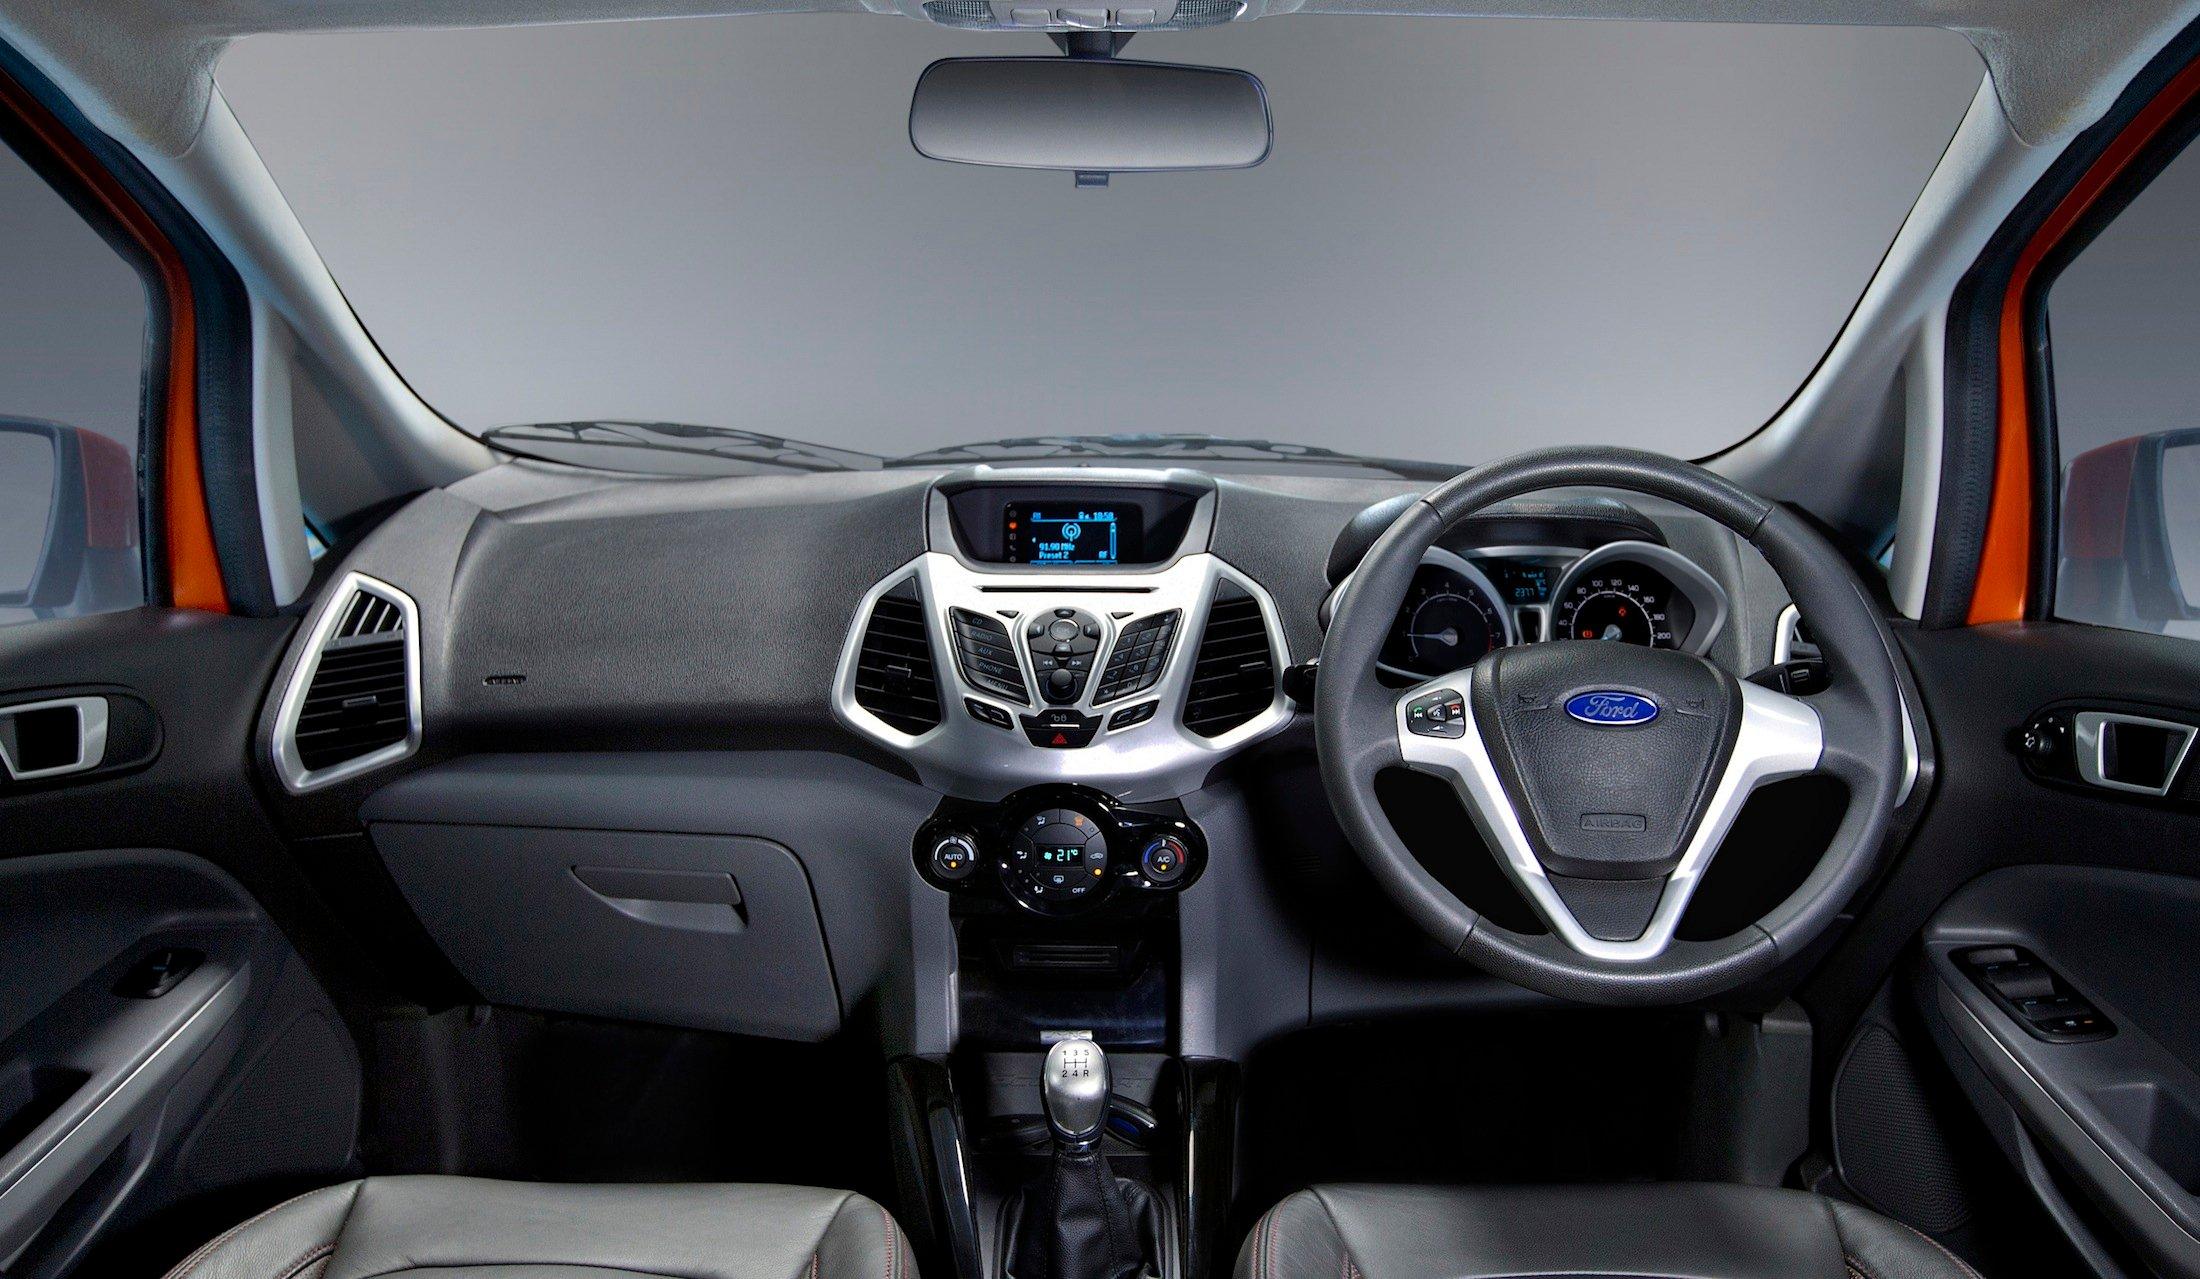 Ford Ecosport Review Photos Caradvice